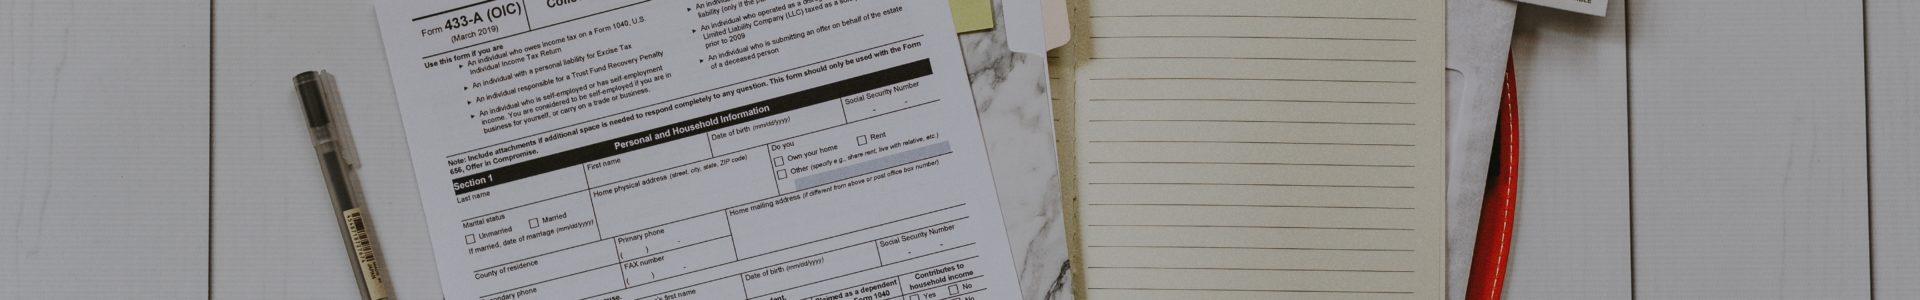 Loi anti-fraude à la TVA : logiciels certifiés au 01/01/2018